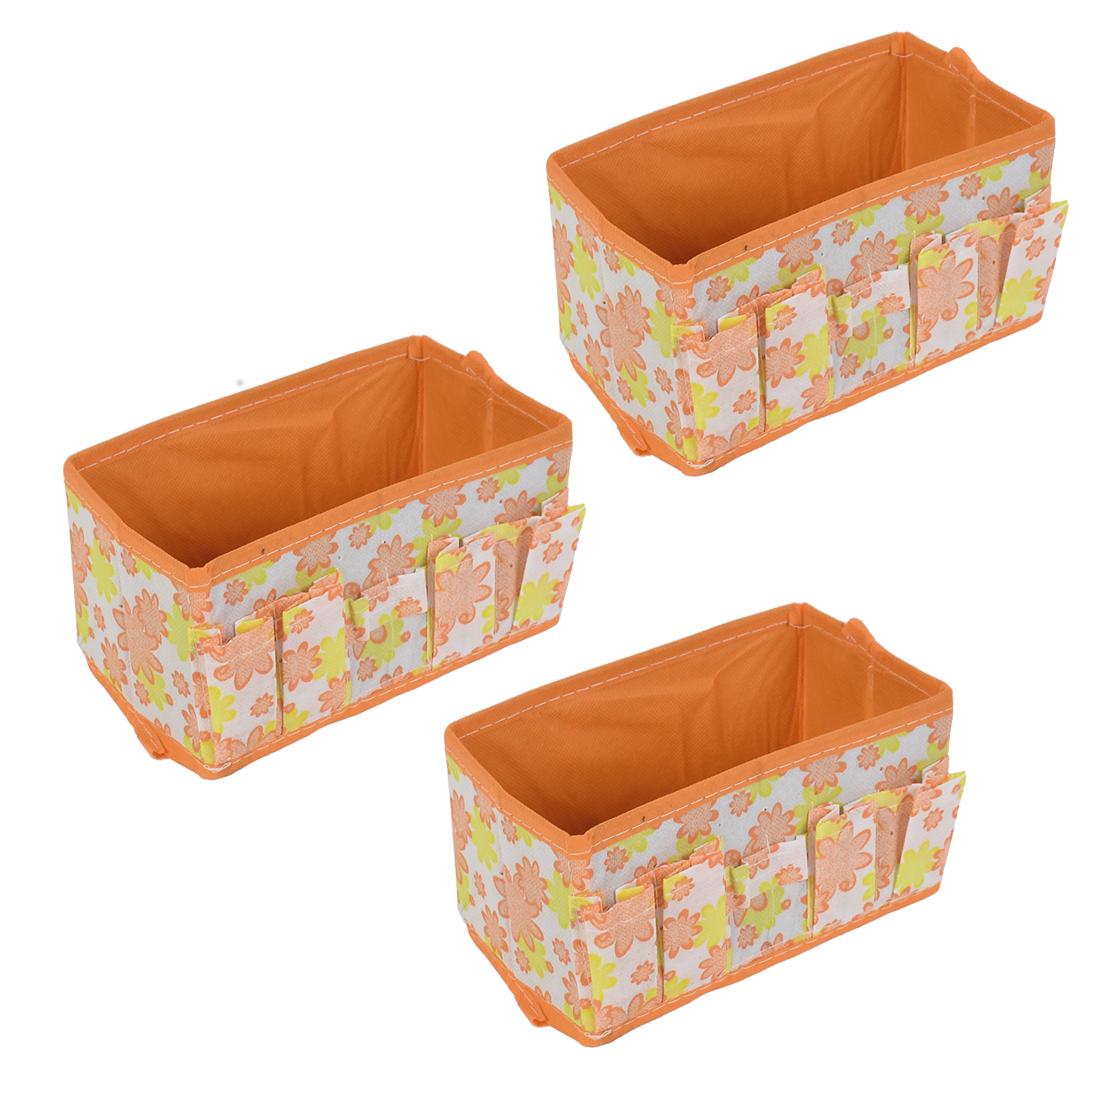 Home Desktop Cosmetic Foldable Floral Pattern Storage Box Case Orange 3pcs